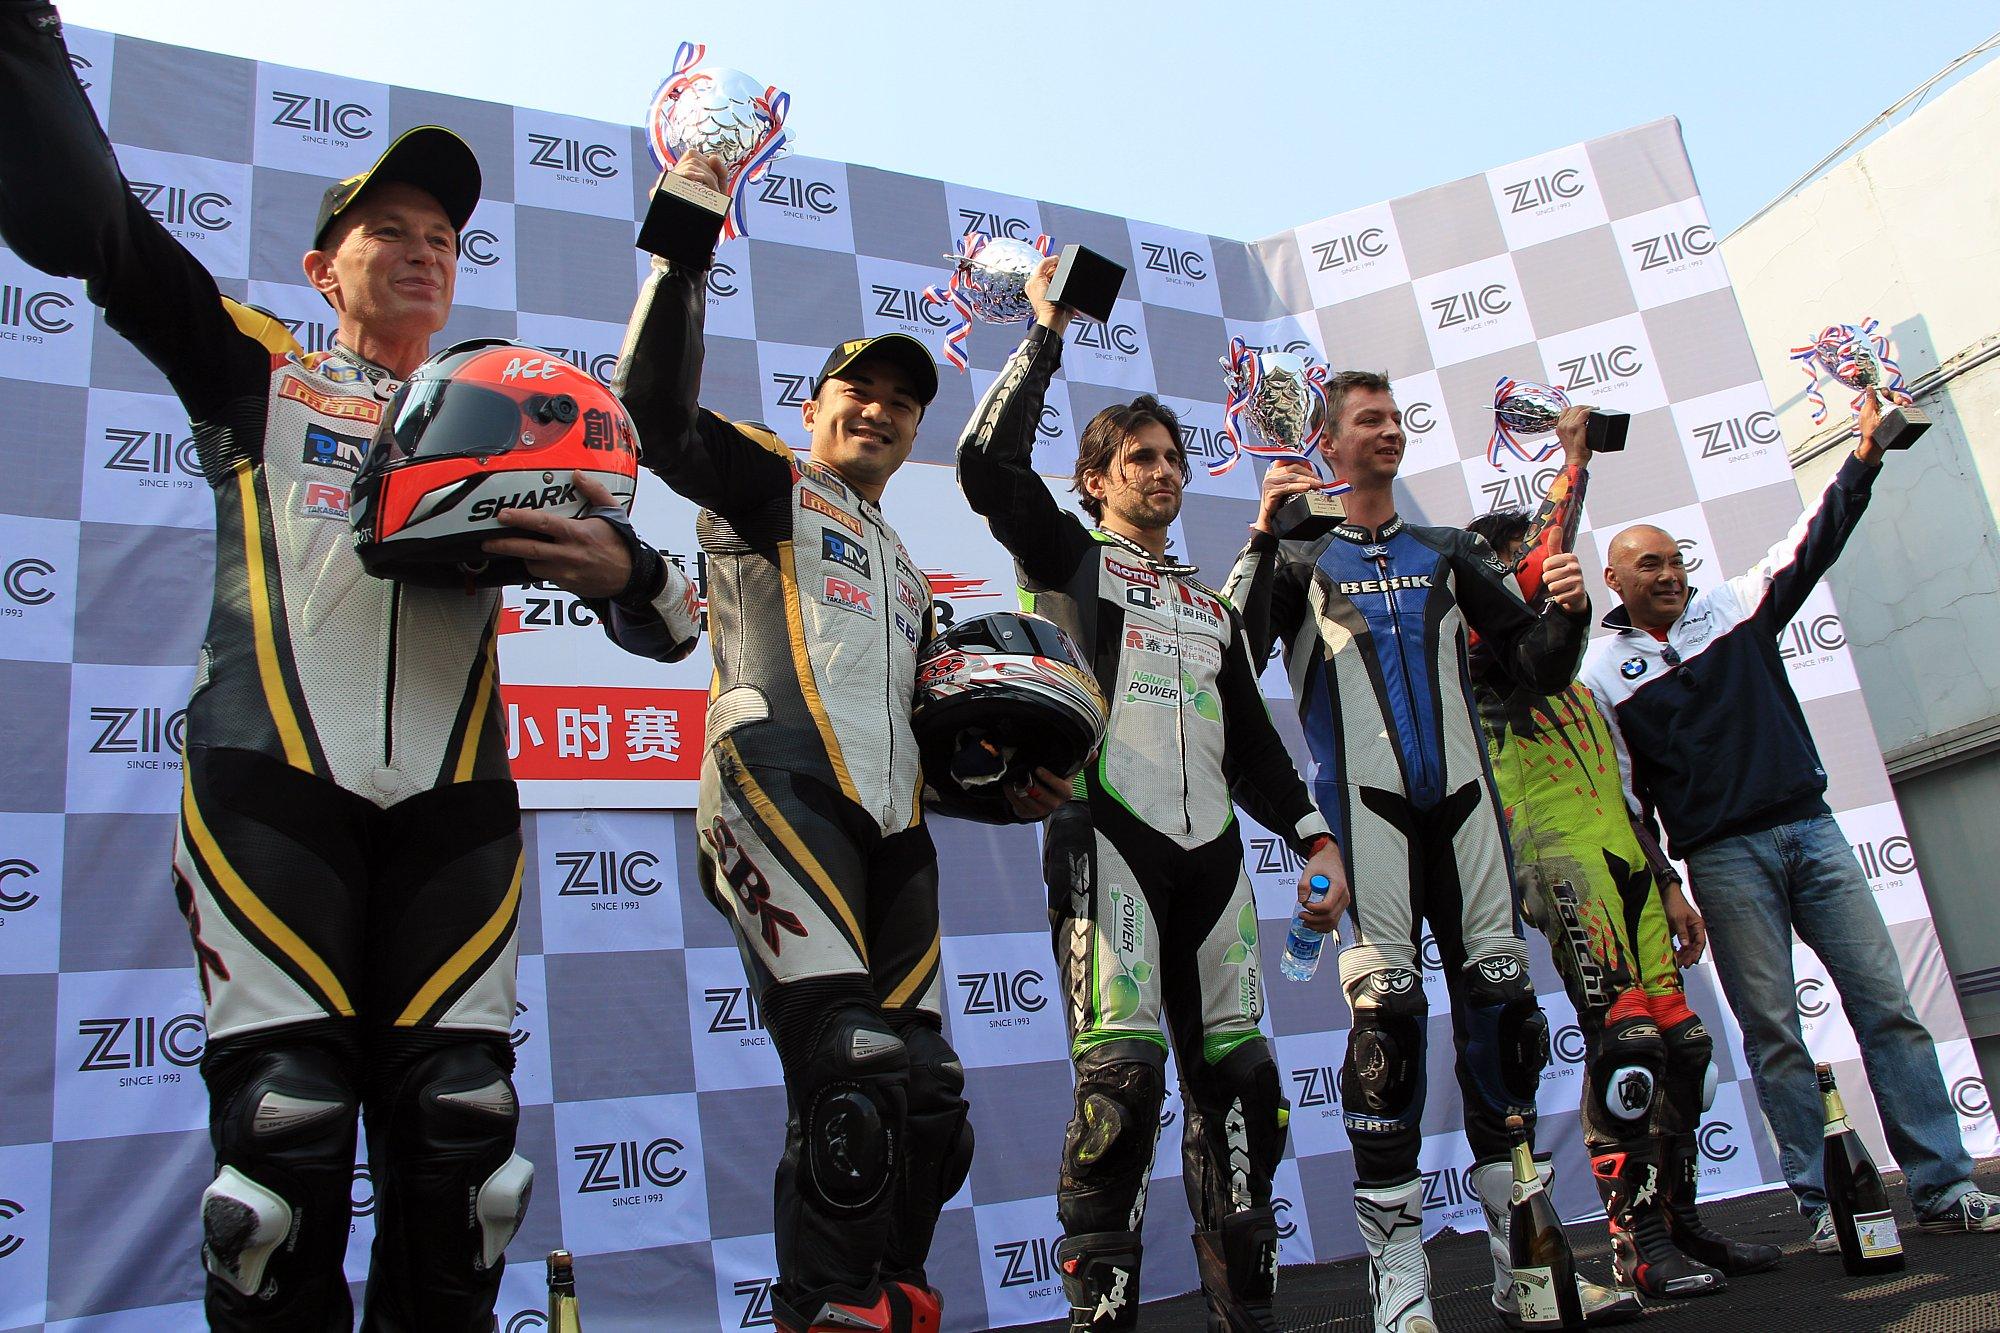 ZIC超级摩托车3小时大赛昨在珠海举行